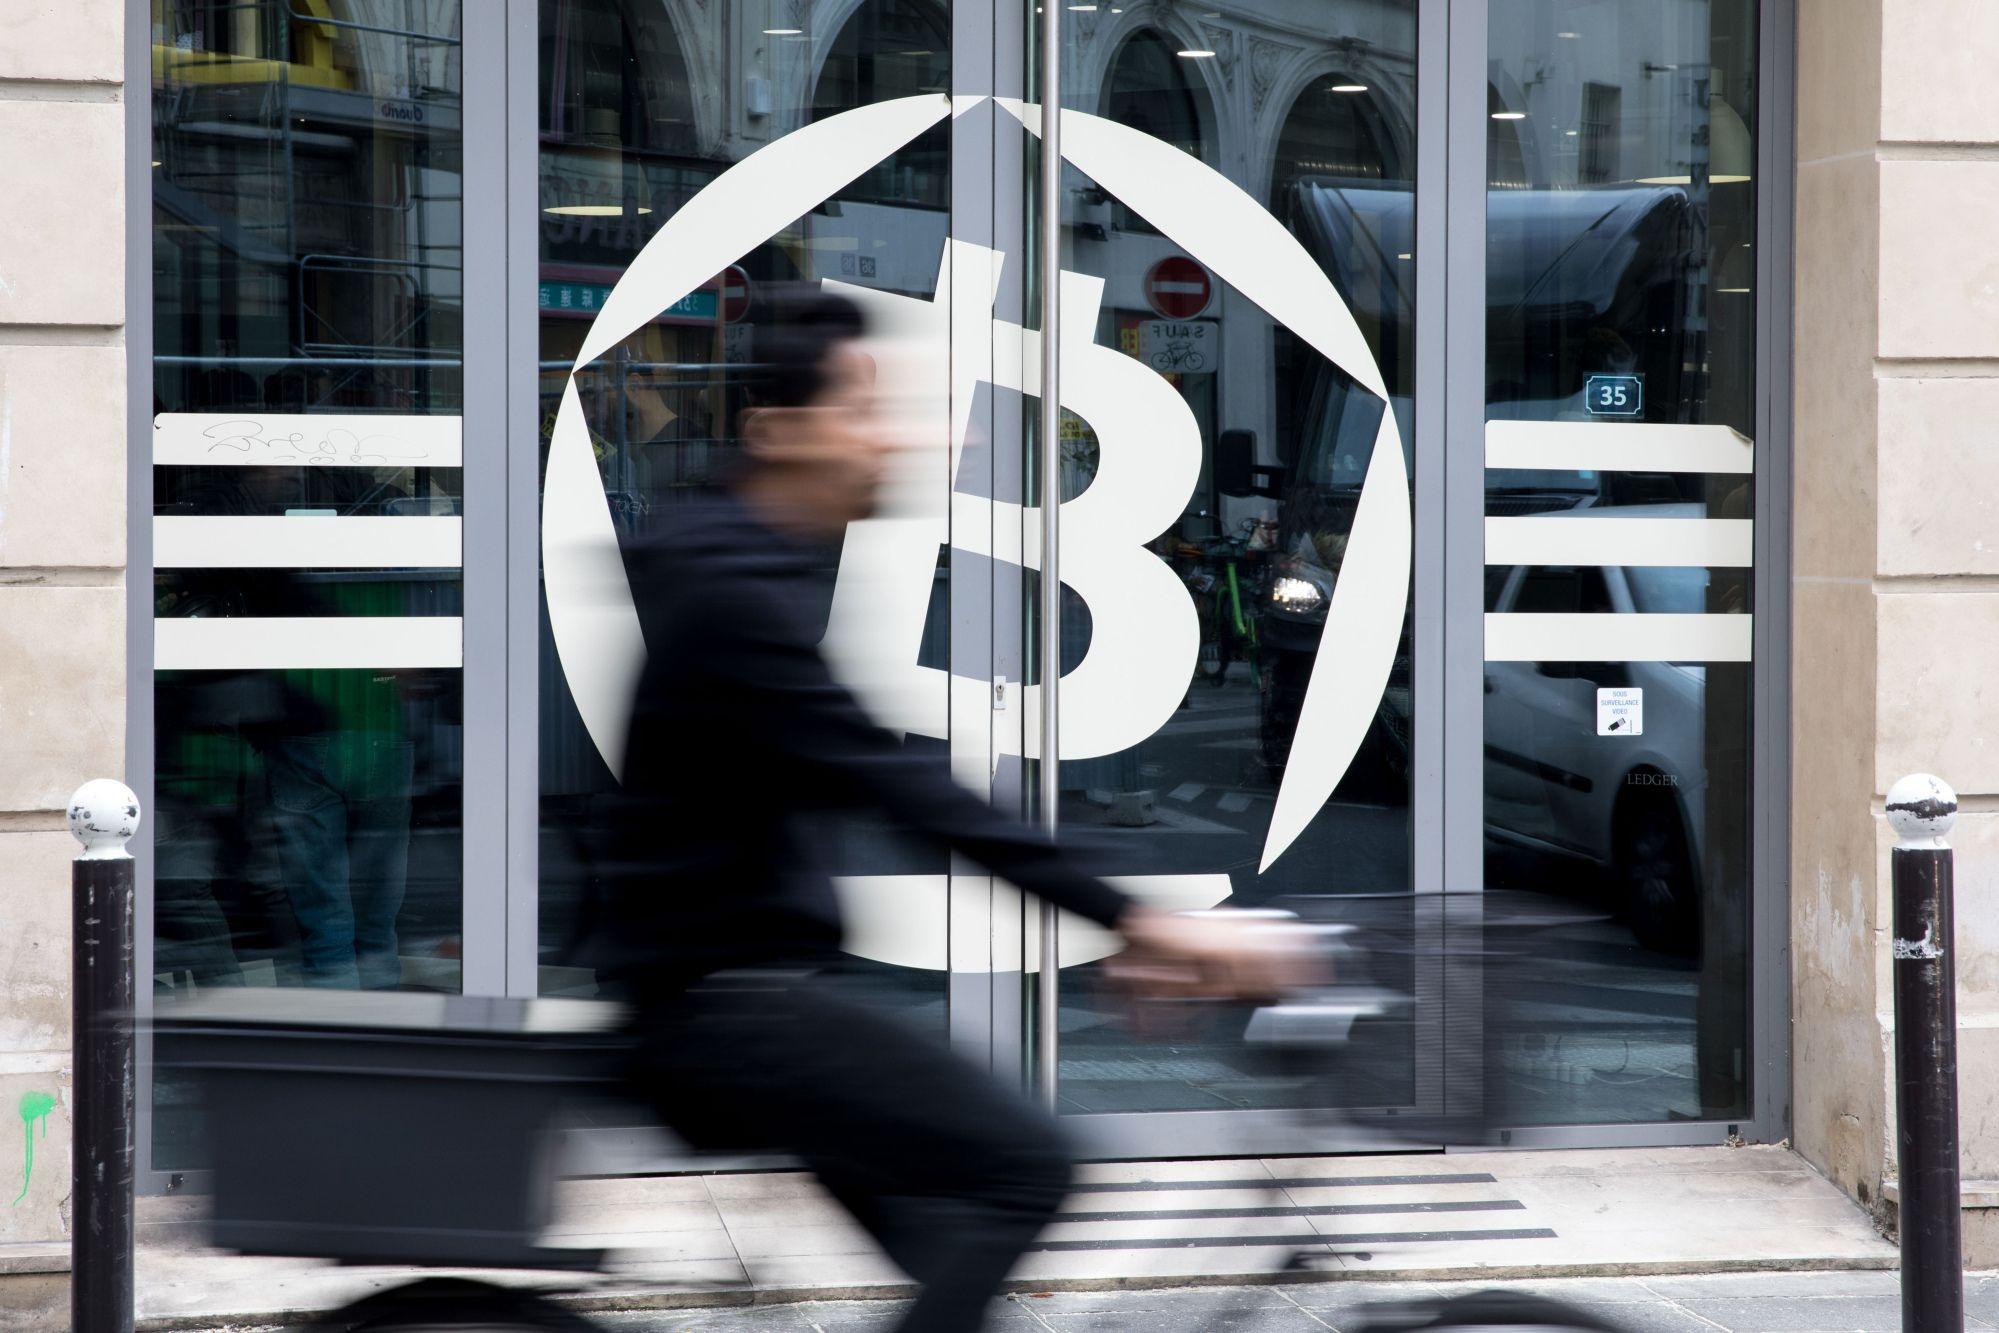 Bitcoin tang do khong con hang xom hay di cua ban mua anh 2